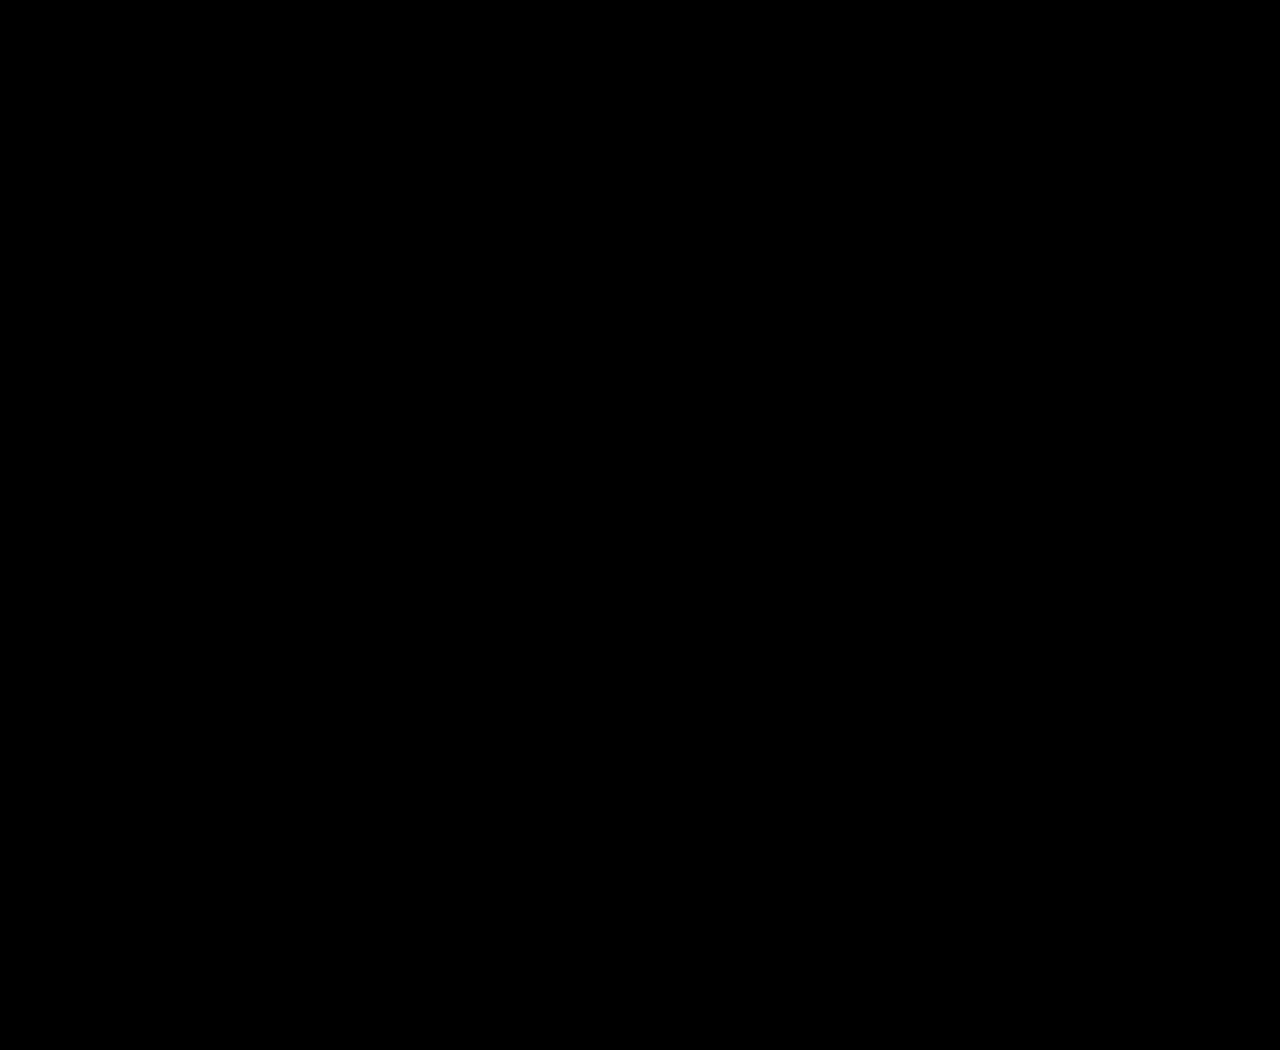 Pasta Clipart Black And White , Transparent Cartoon.